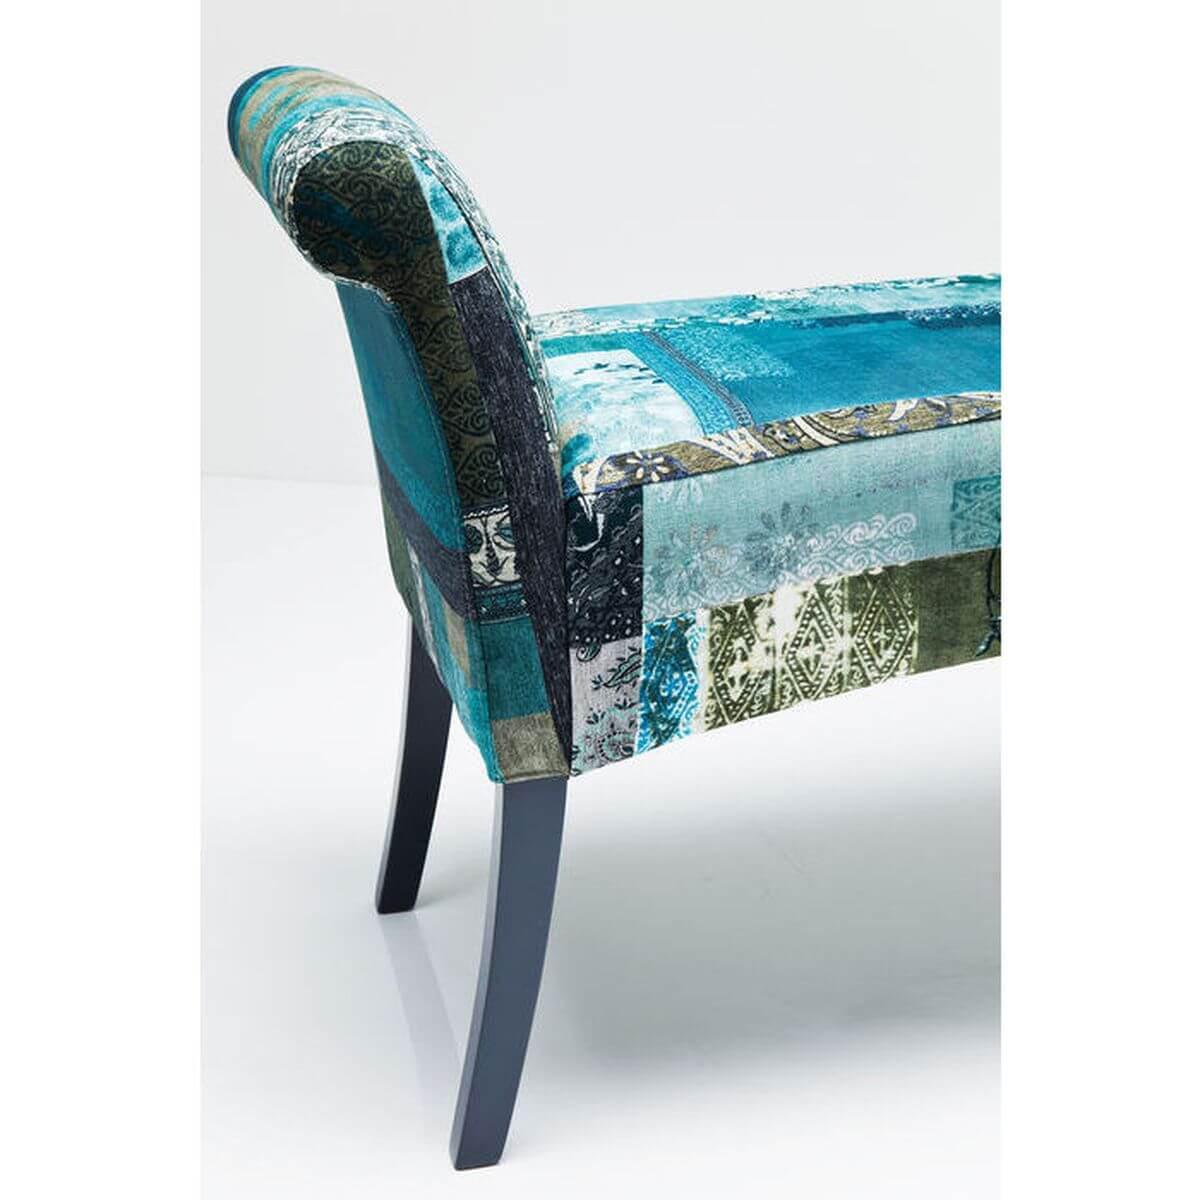 Banc MOTLEY Kare Design blue hour